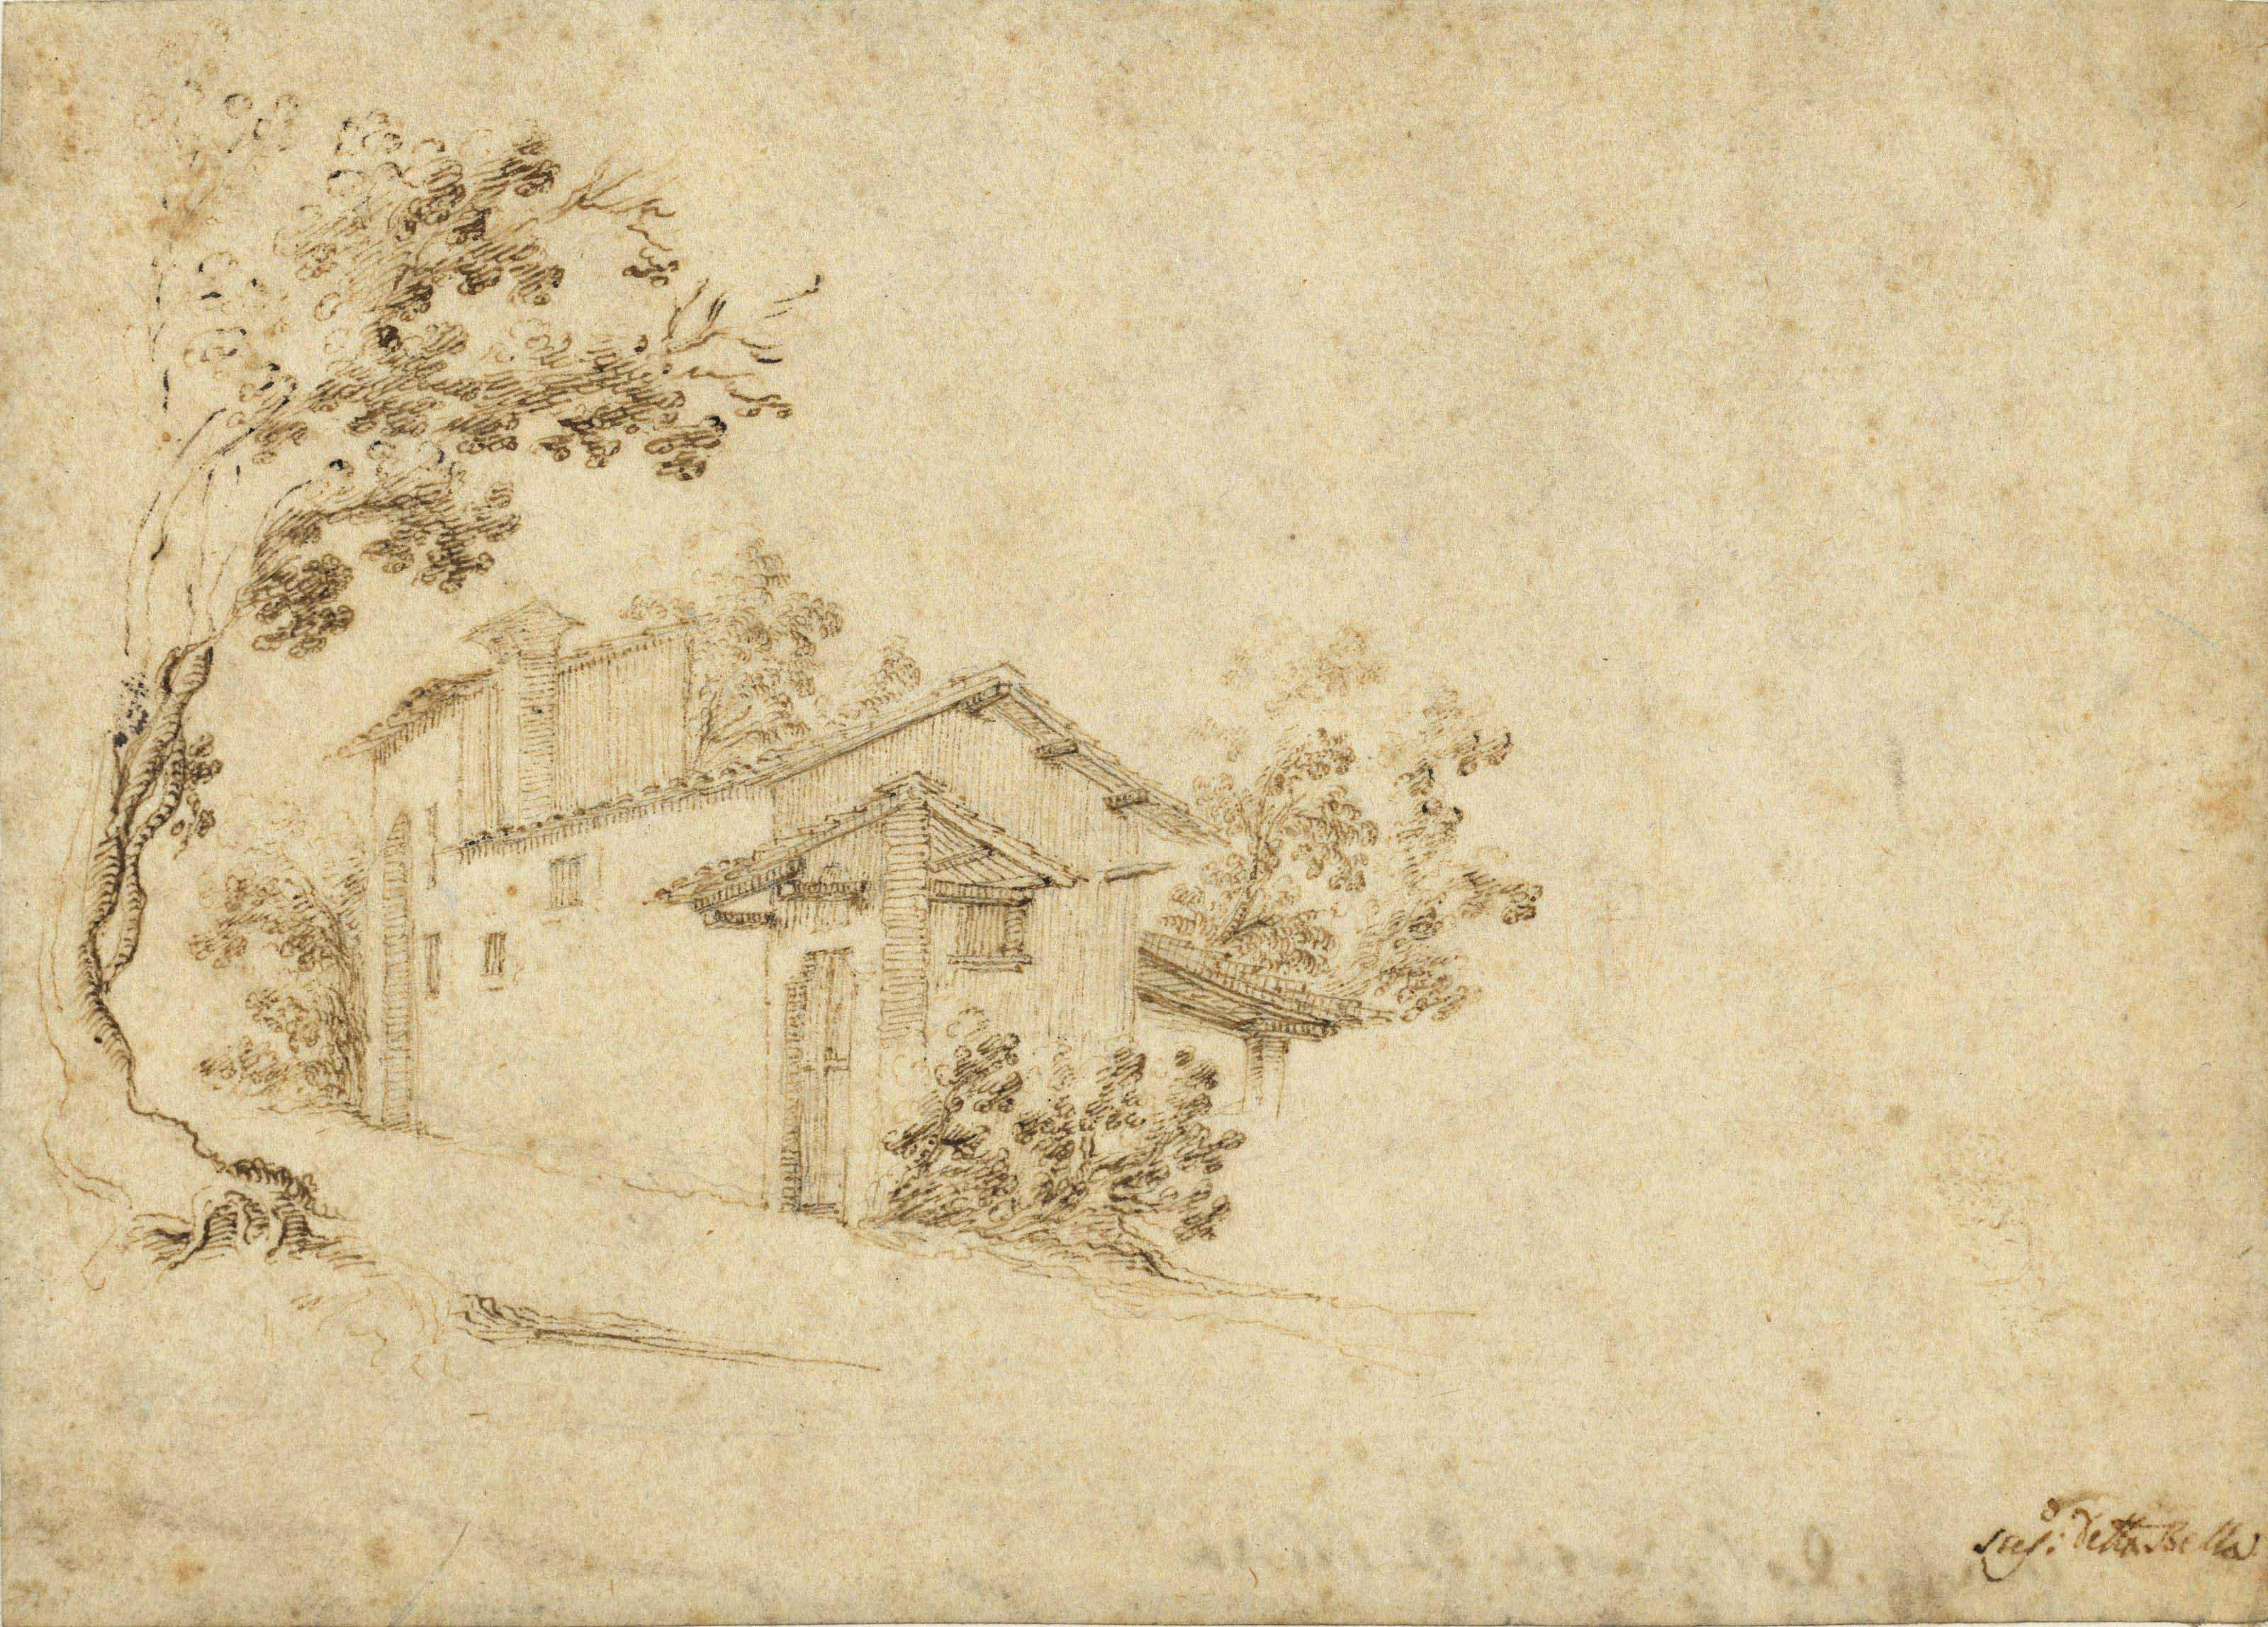 A farmhouse among trees